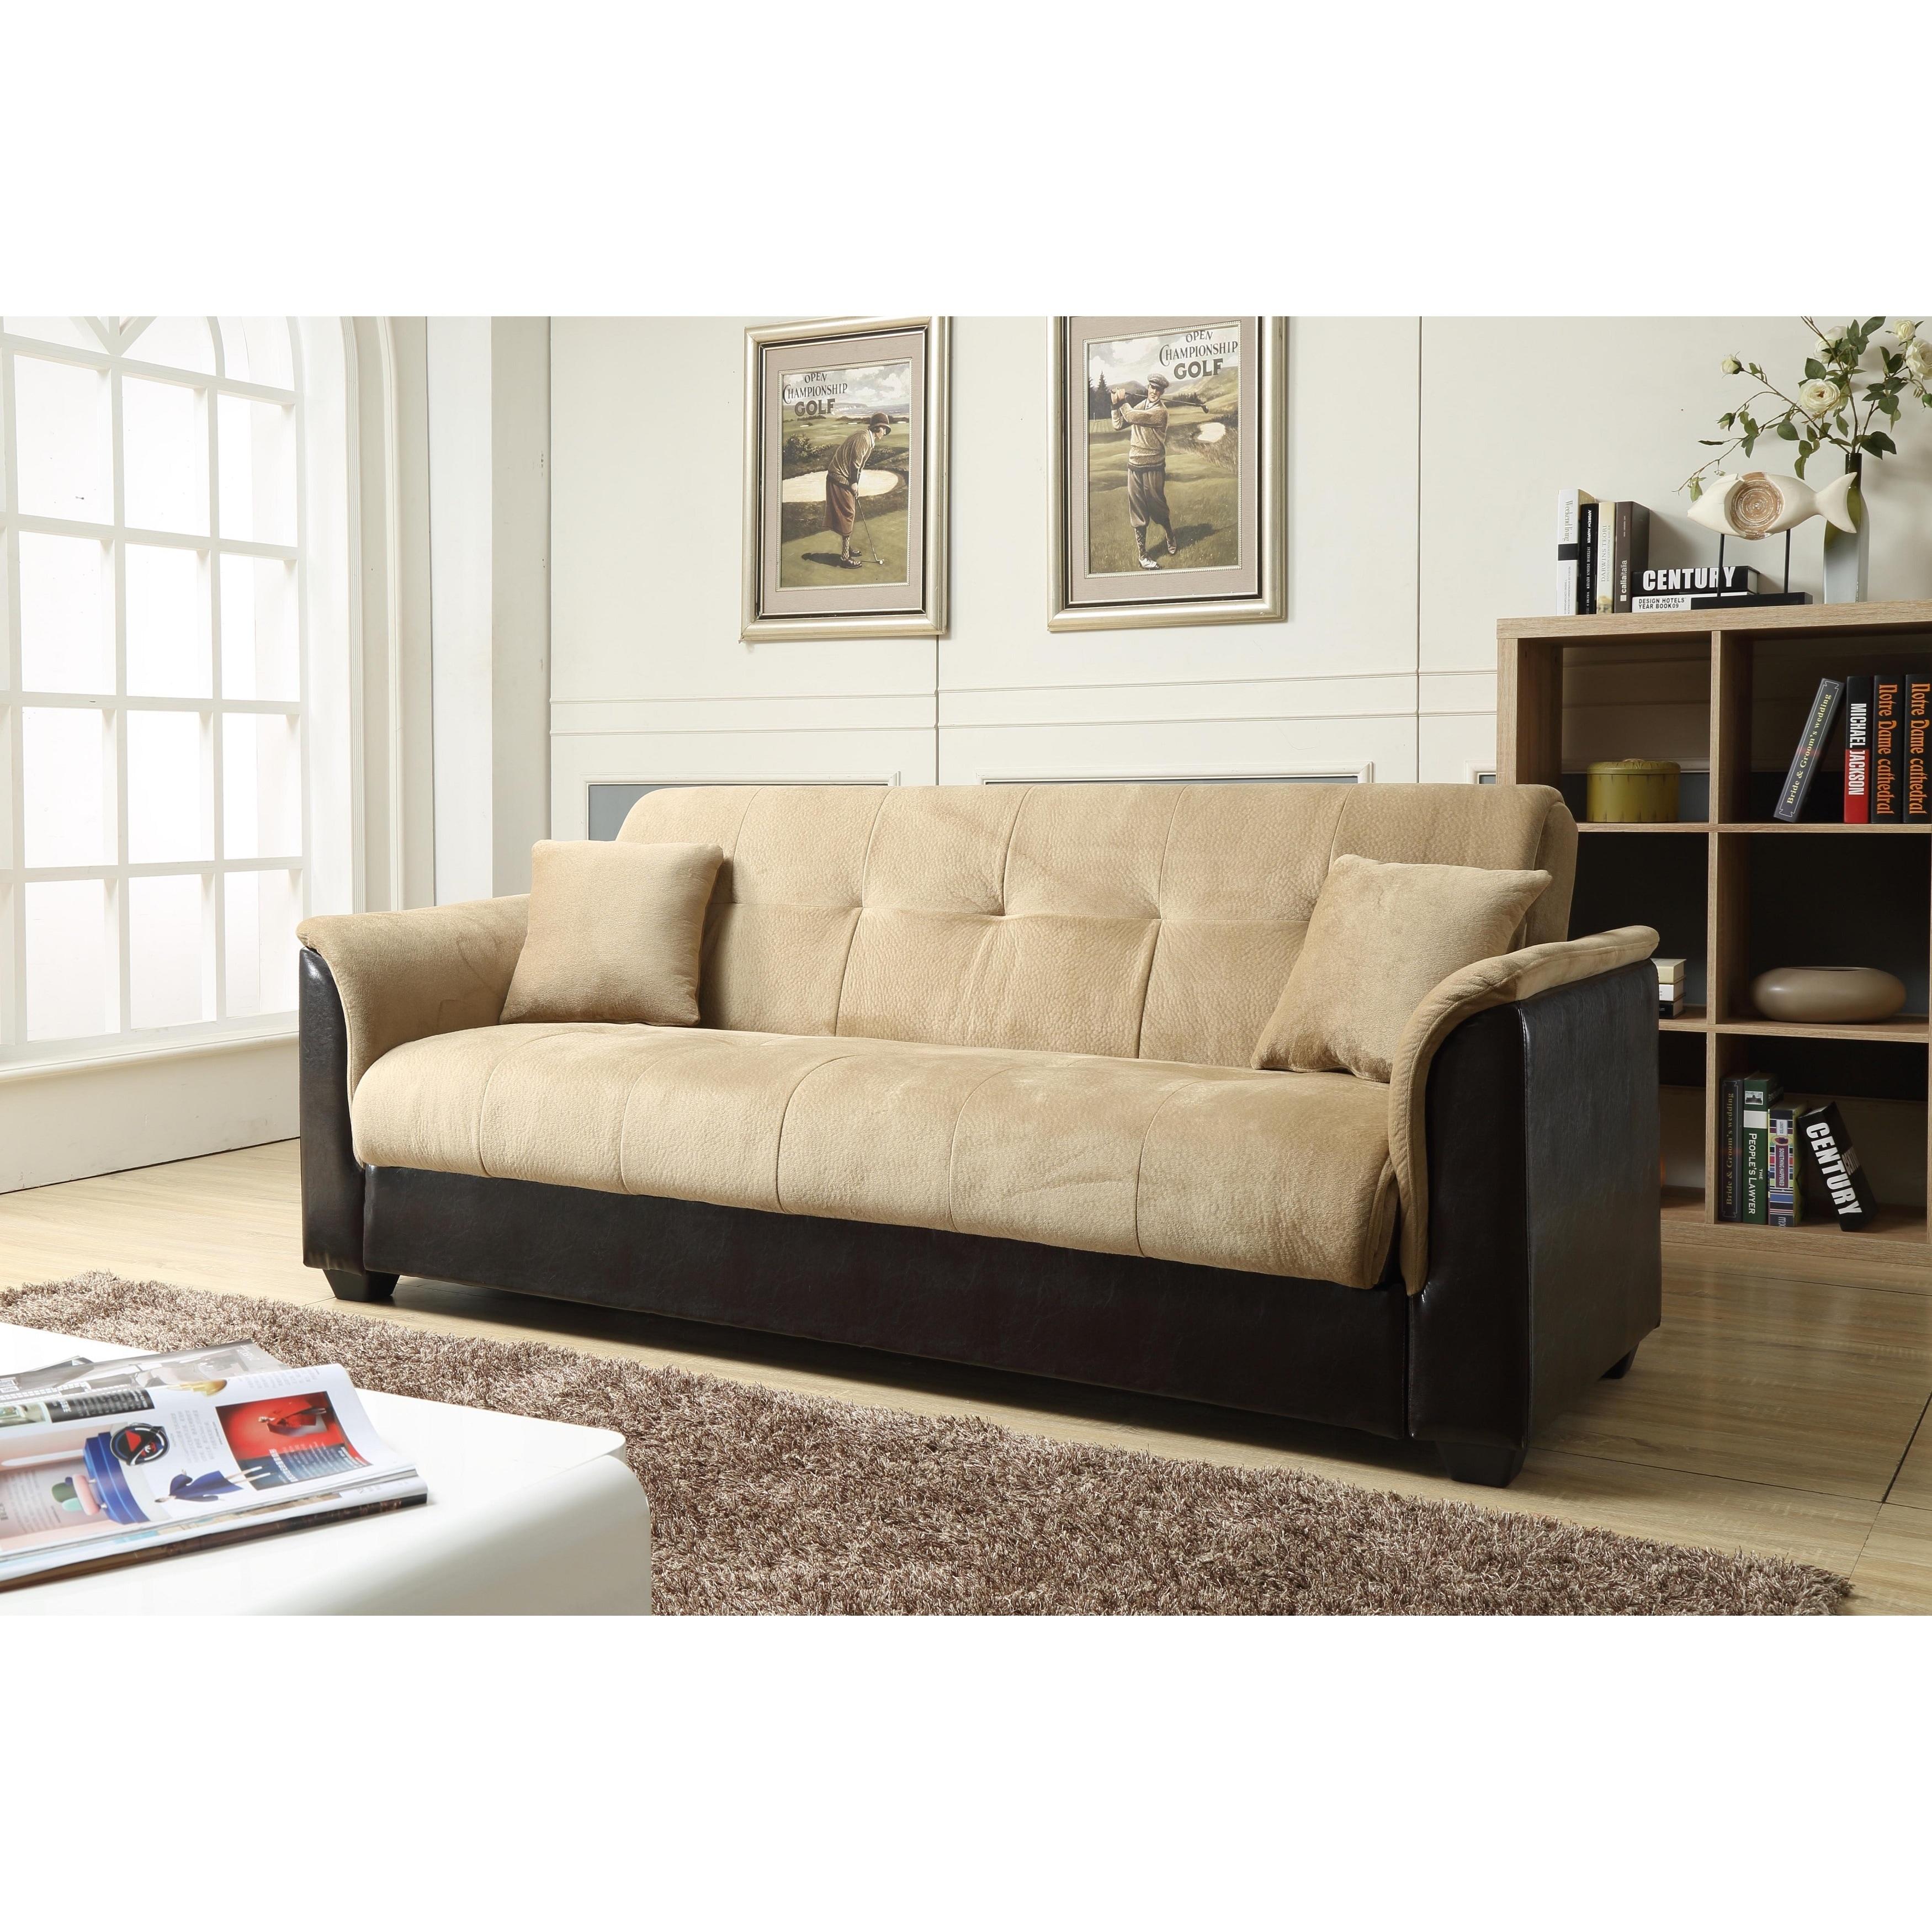 Shop Nathanial Home Melanie Champion Storage Futon Sofa Bed Free